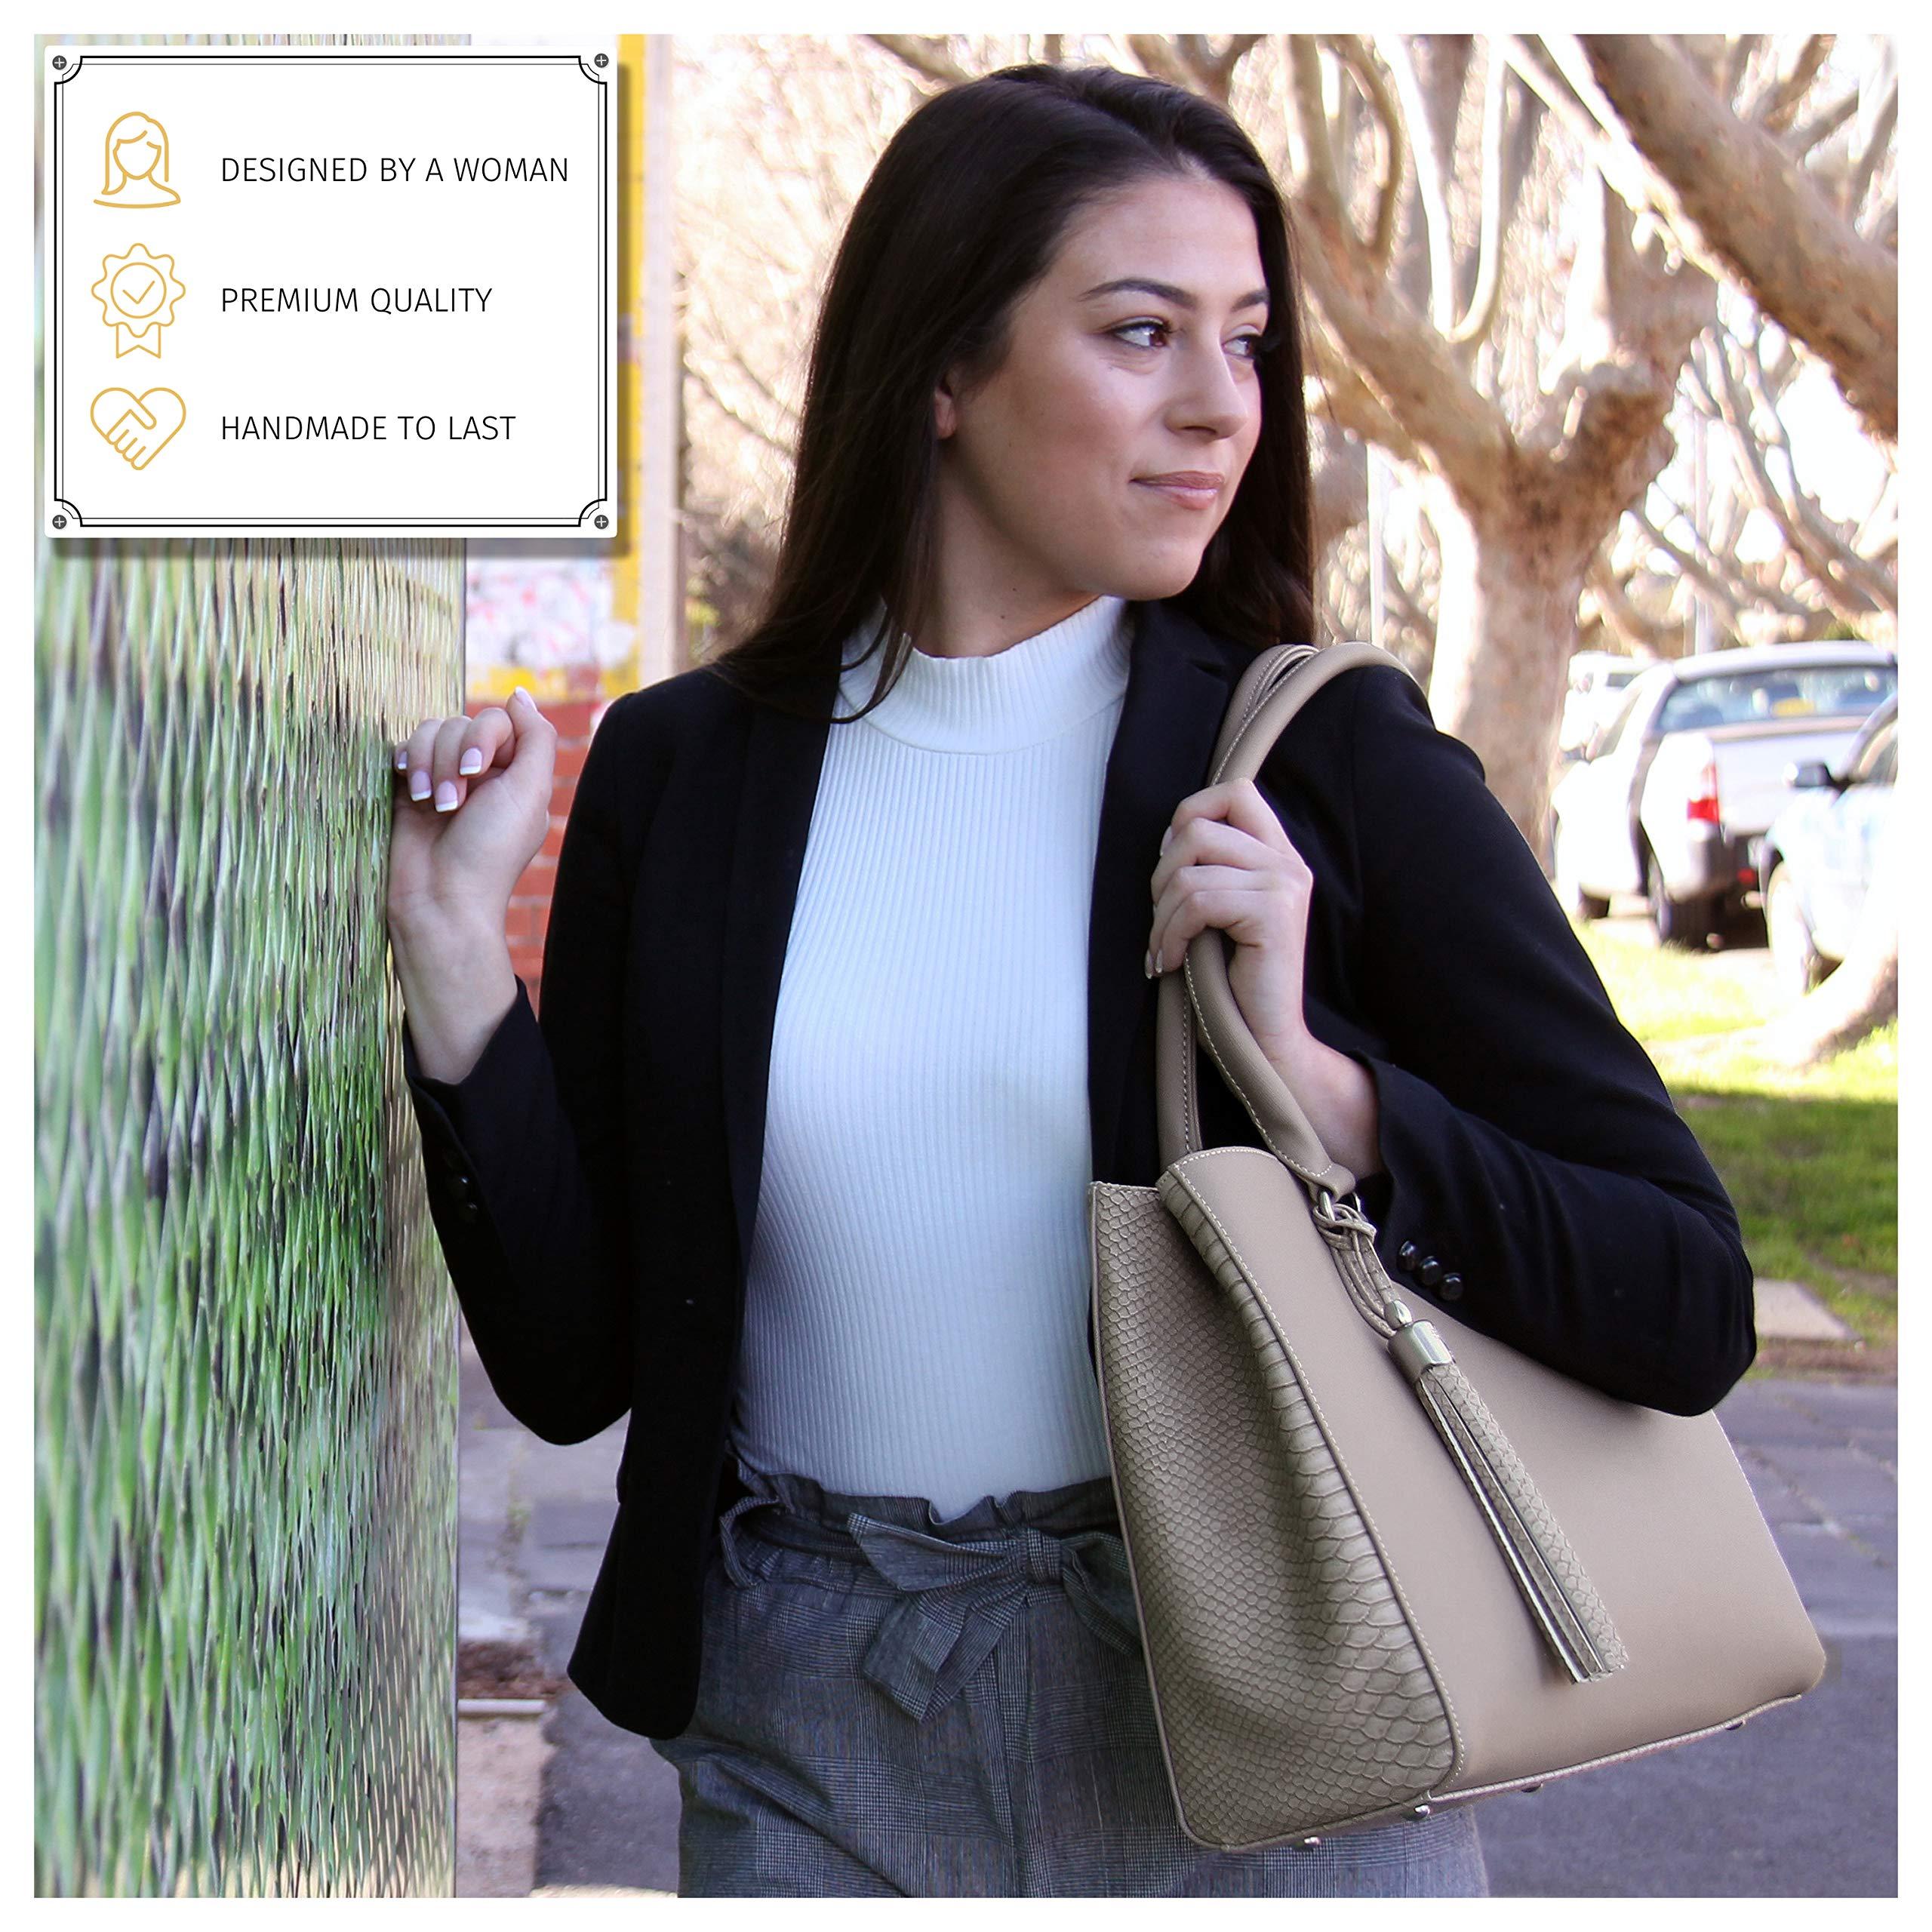 BFB Replacement Purse Handbag Laptop Bag Briefcase Messenger Travel Tote Handmade Shoulder Straps Make Your Bag Look with New Detachable Professional Designer Handles